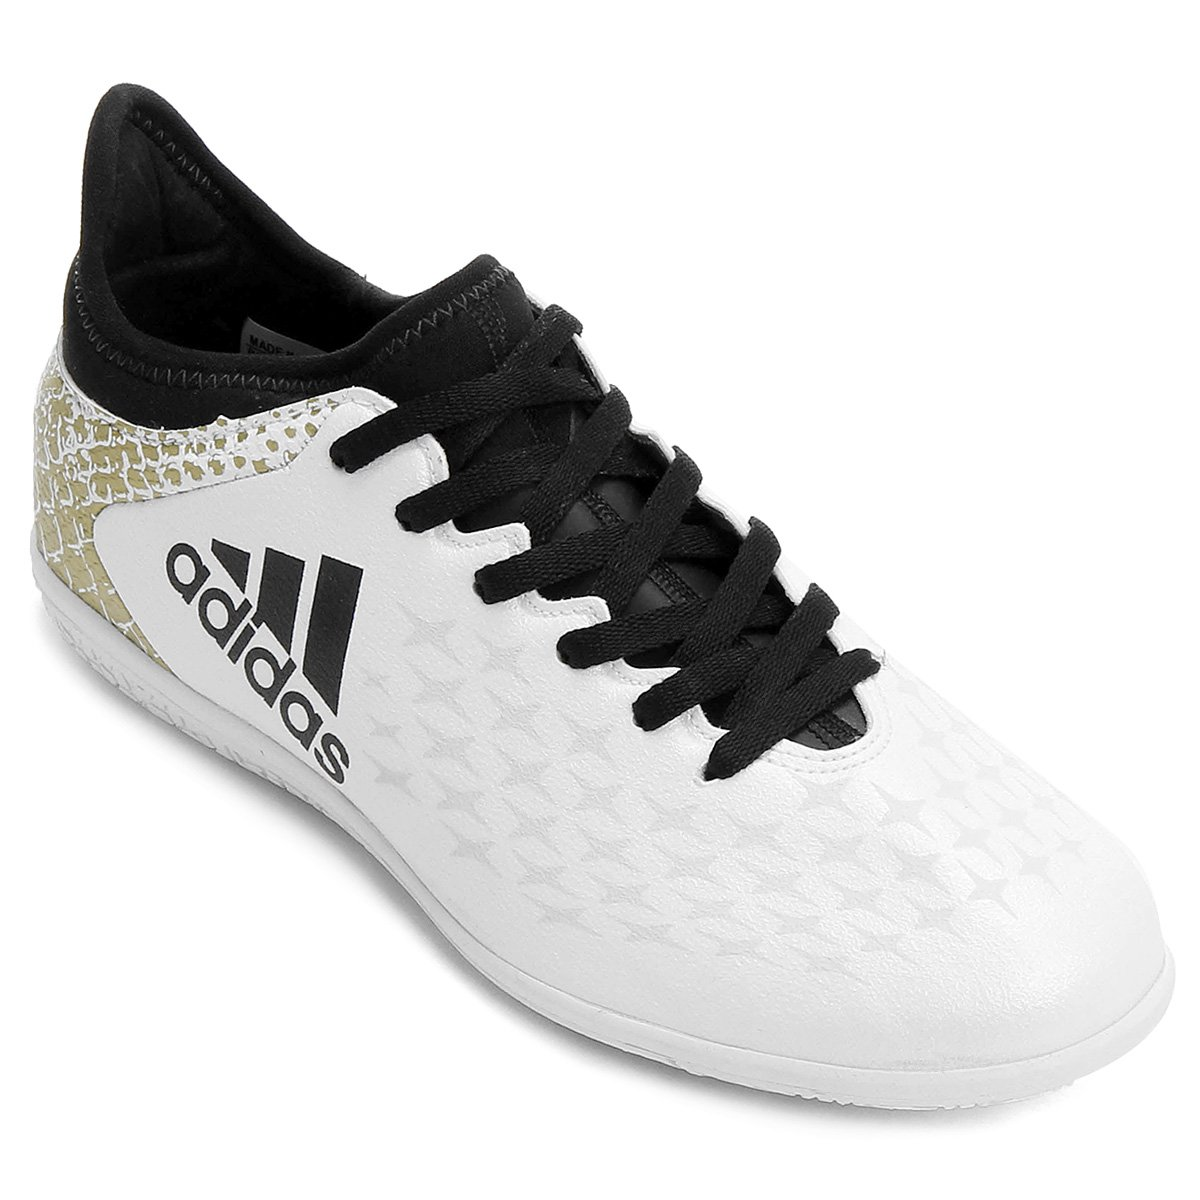 Chuteira Adidas X 16.3 IN Futsal Infantil - Compre Agora  87875dd79f5e4